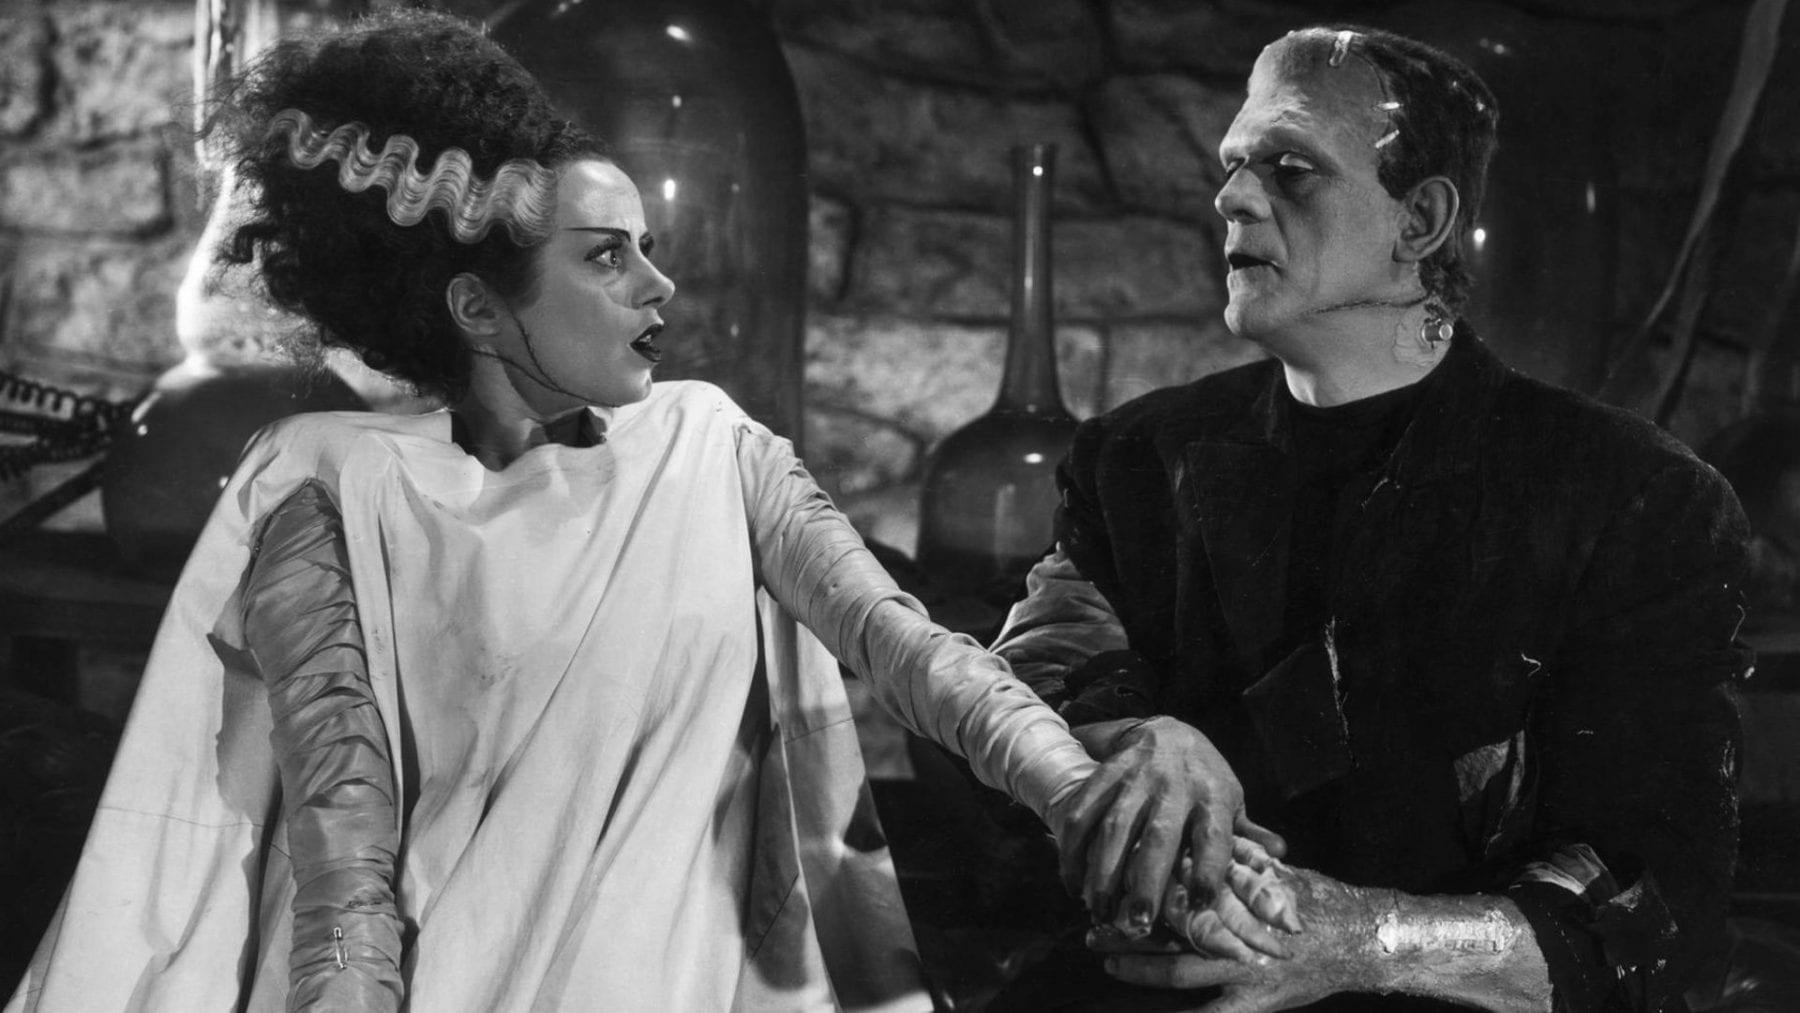 Bride of Frankenstein's arm being grabbed by Frankenstein's monster